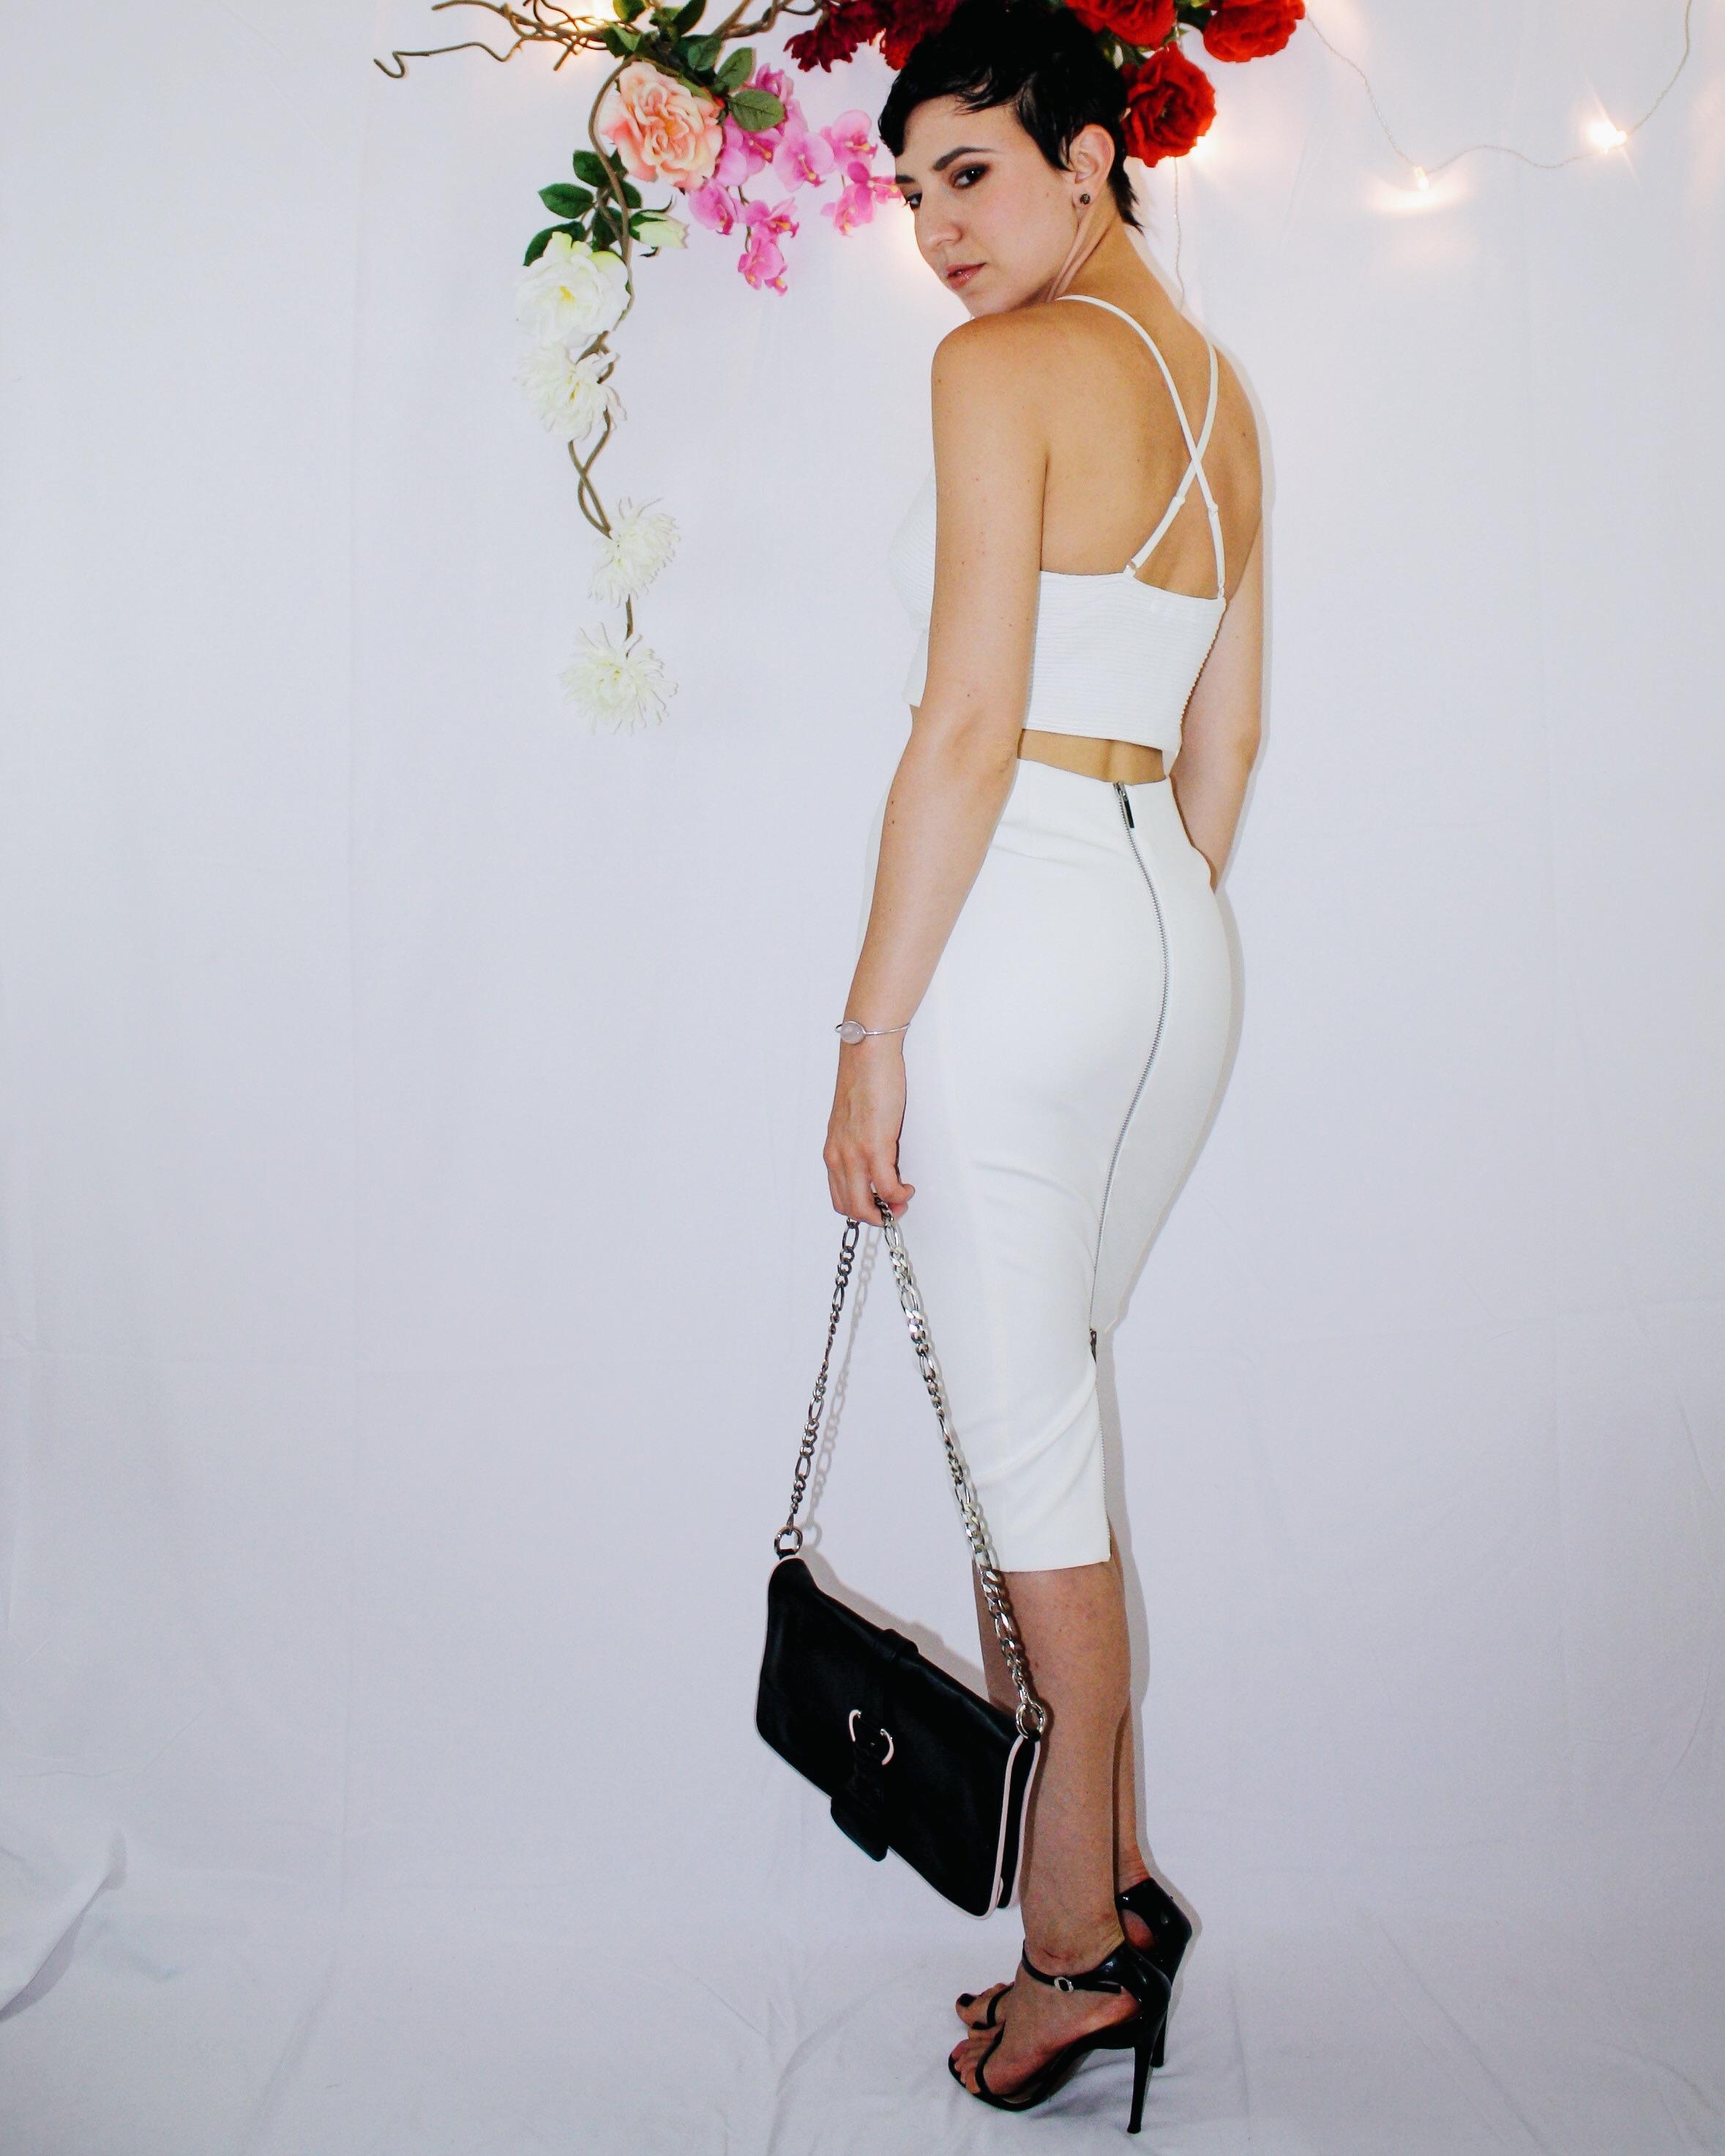 white skirt two ways elizabeth and james vintage second hand missguided crop top bag zipper black sandal dior dolce gabbana 2